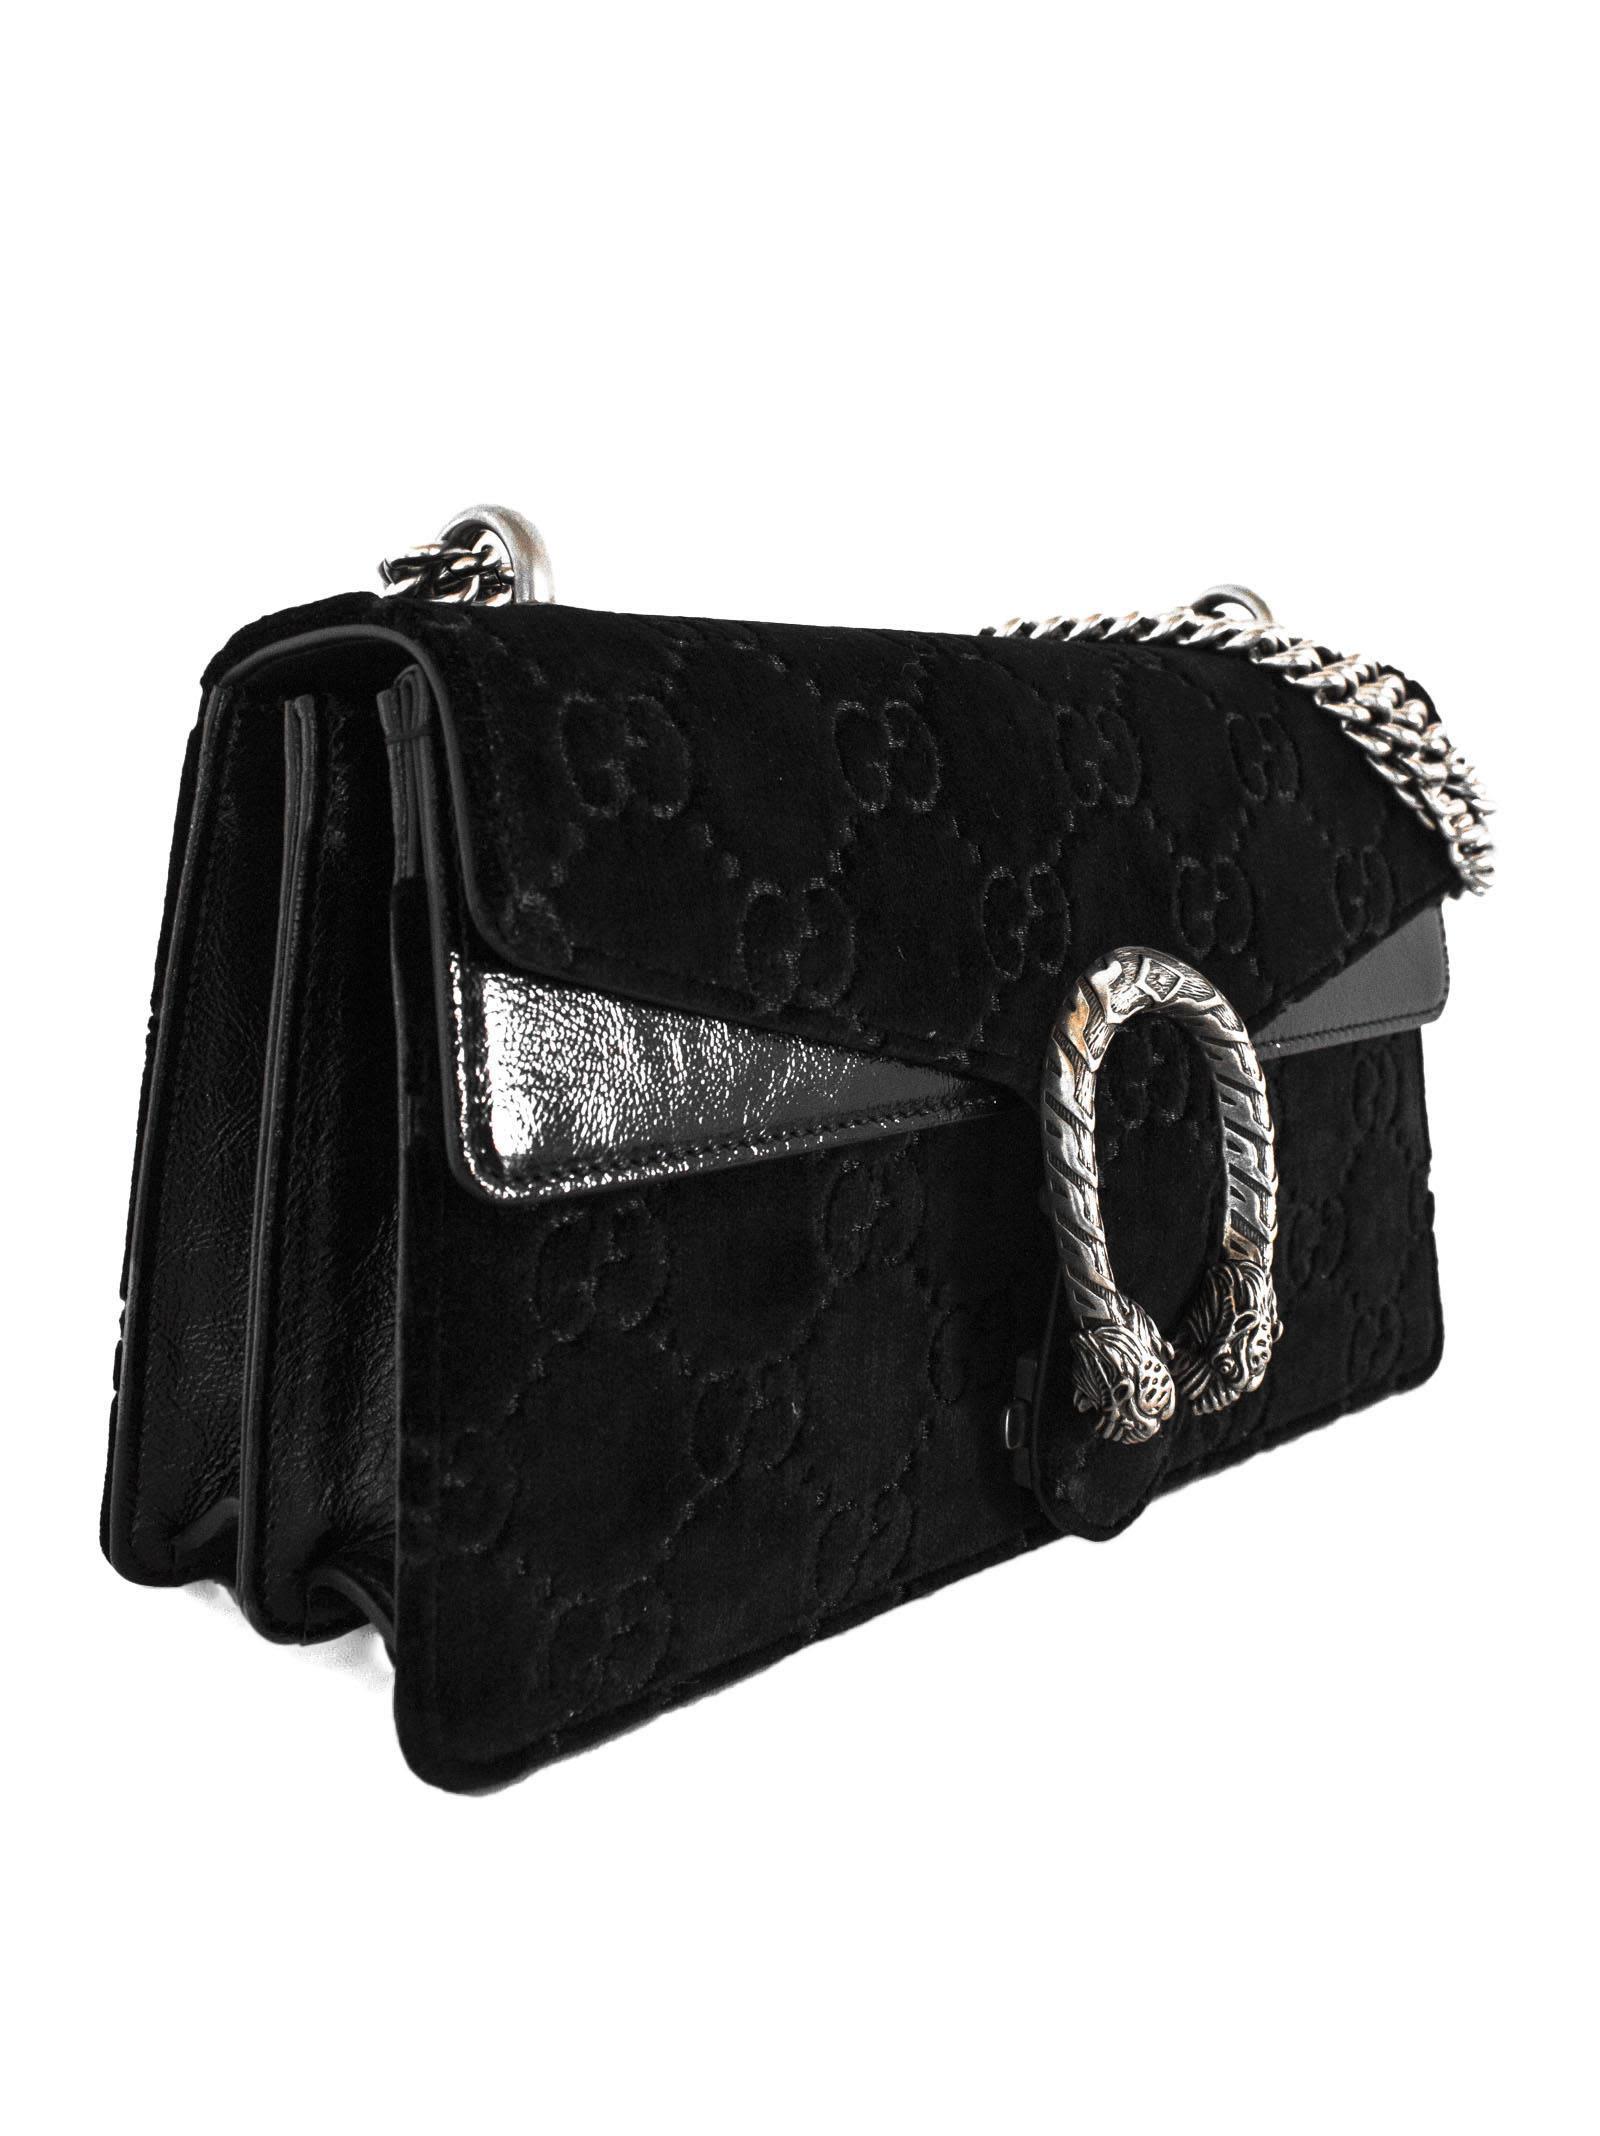 e13d3d12e43 Gucci Gucci Black Dionysus Gg Velvet Small Shoulder Bag - Nero ...